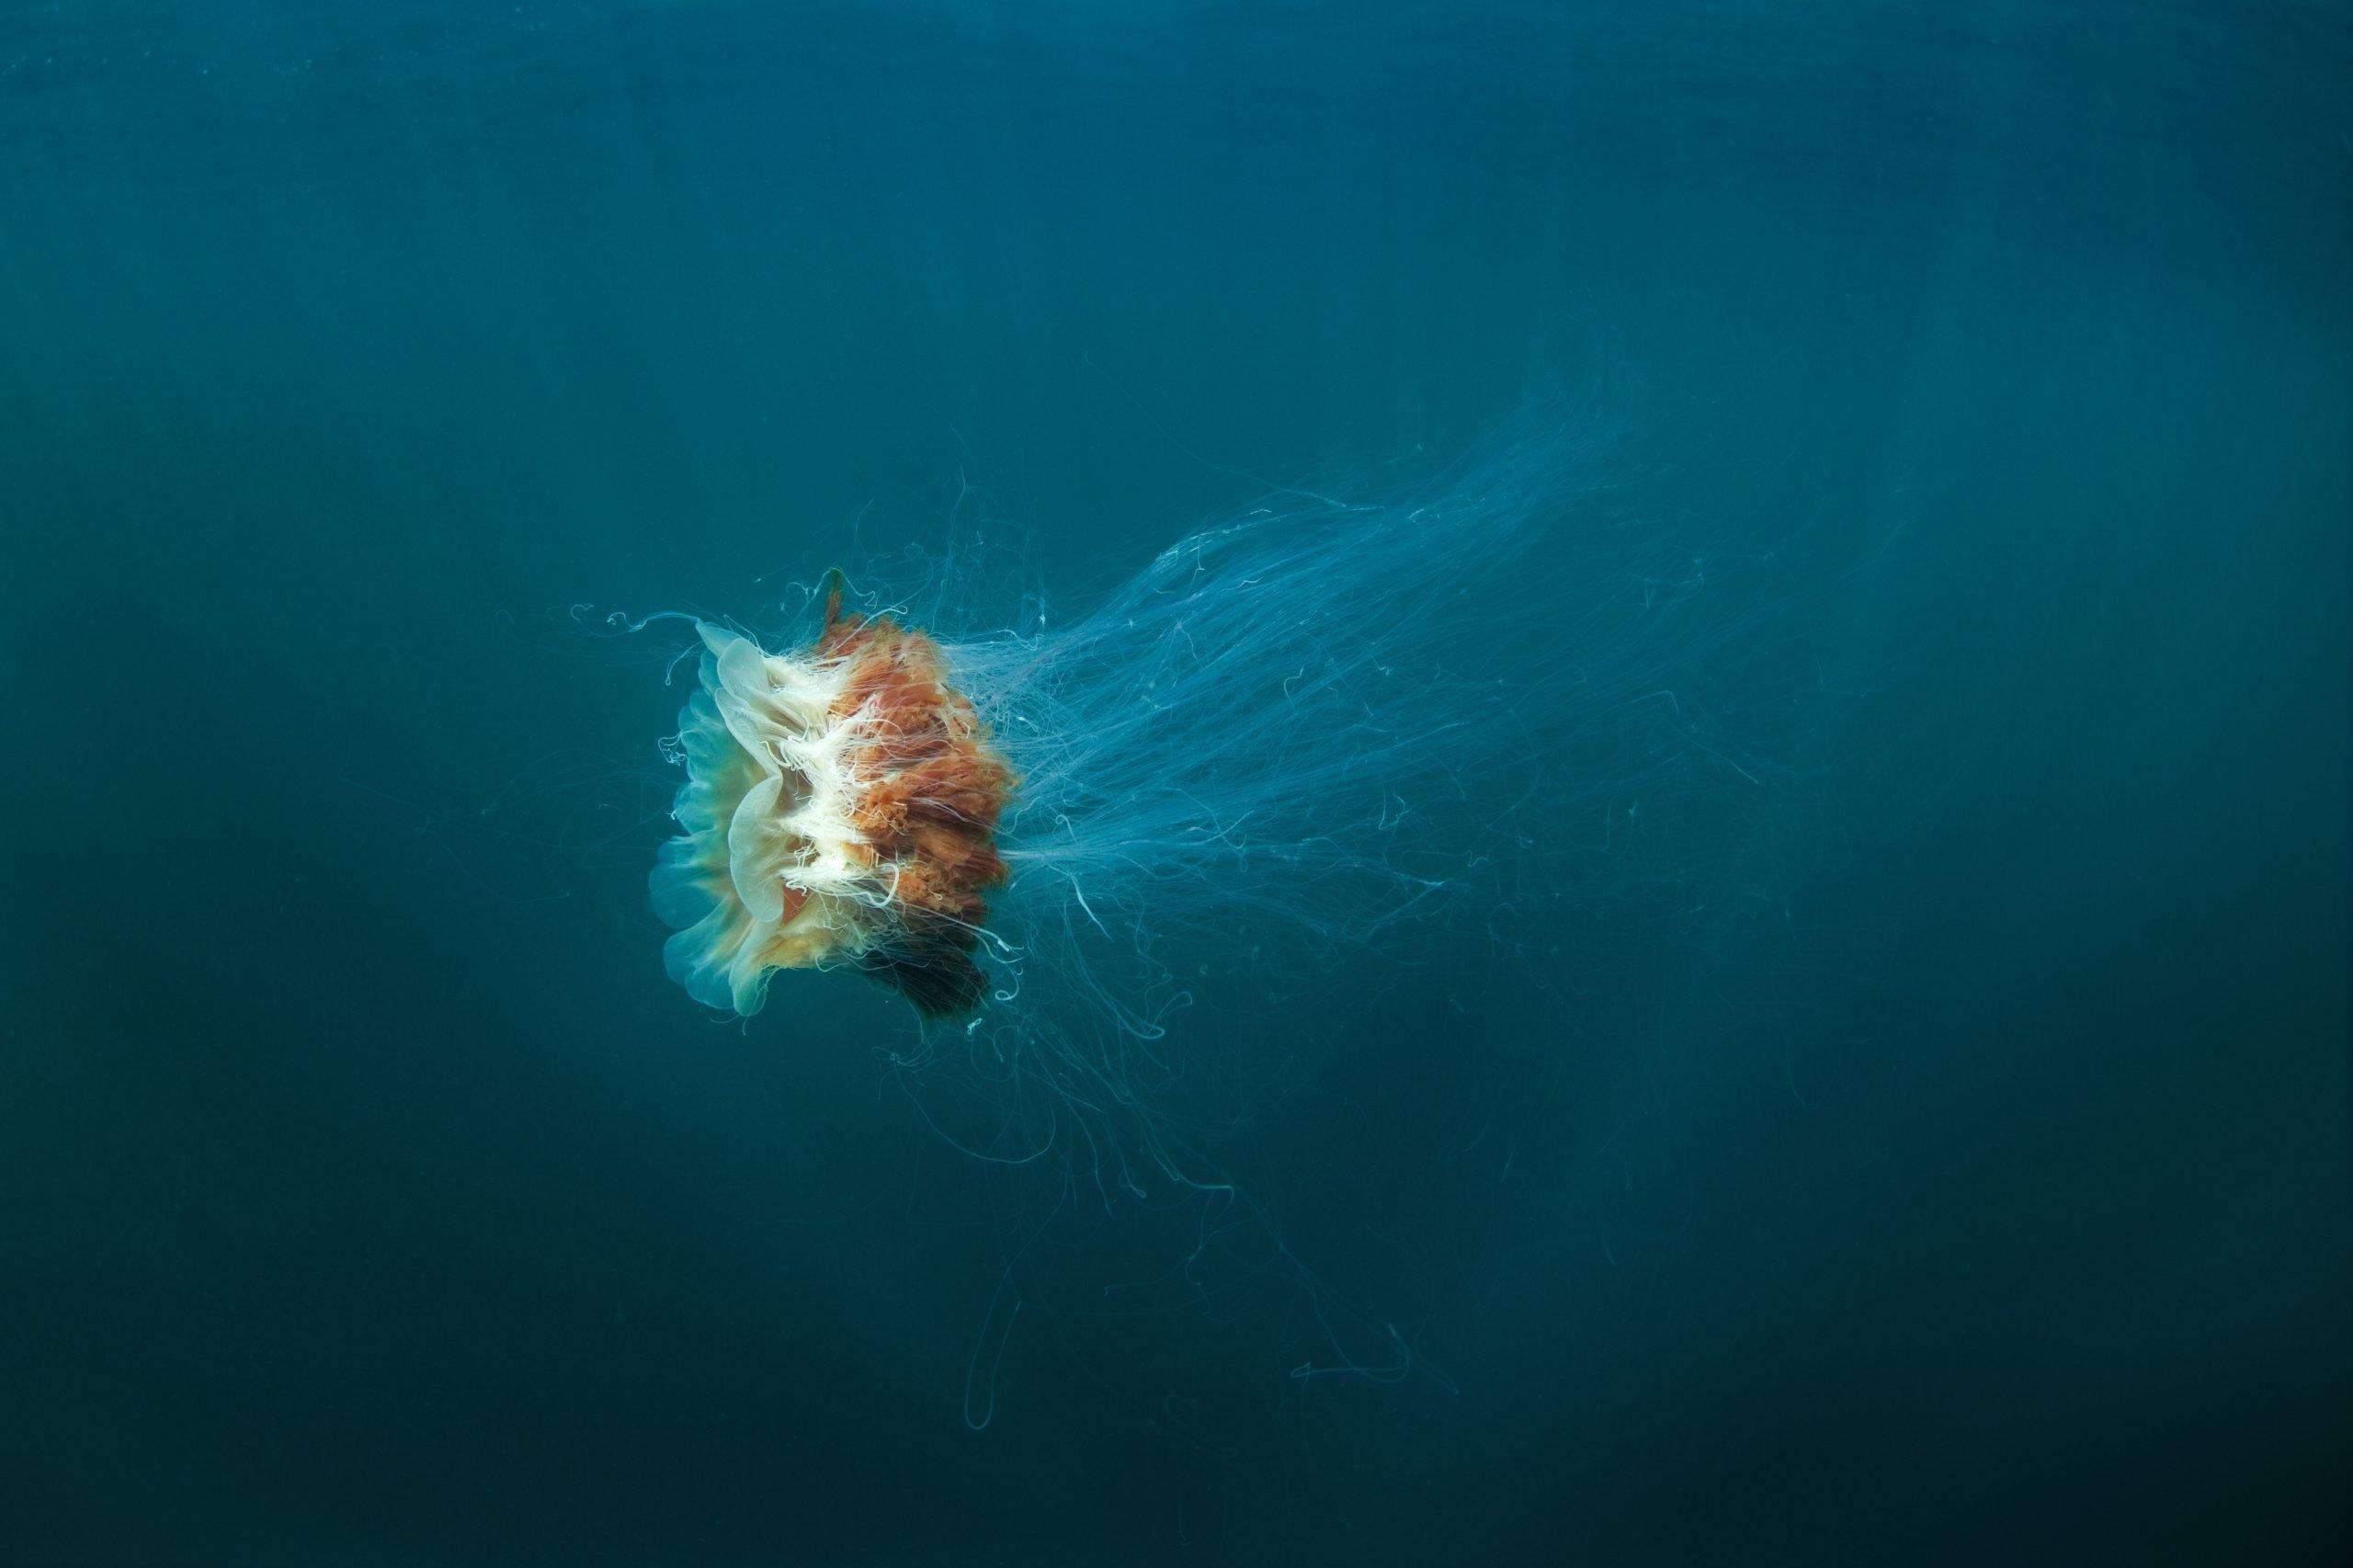 swimming lions mane jellyfish